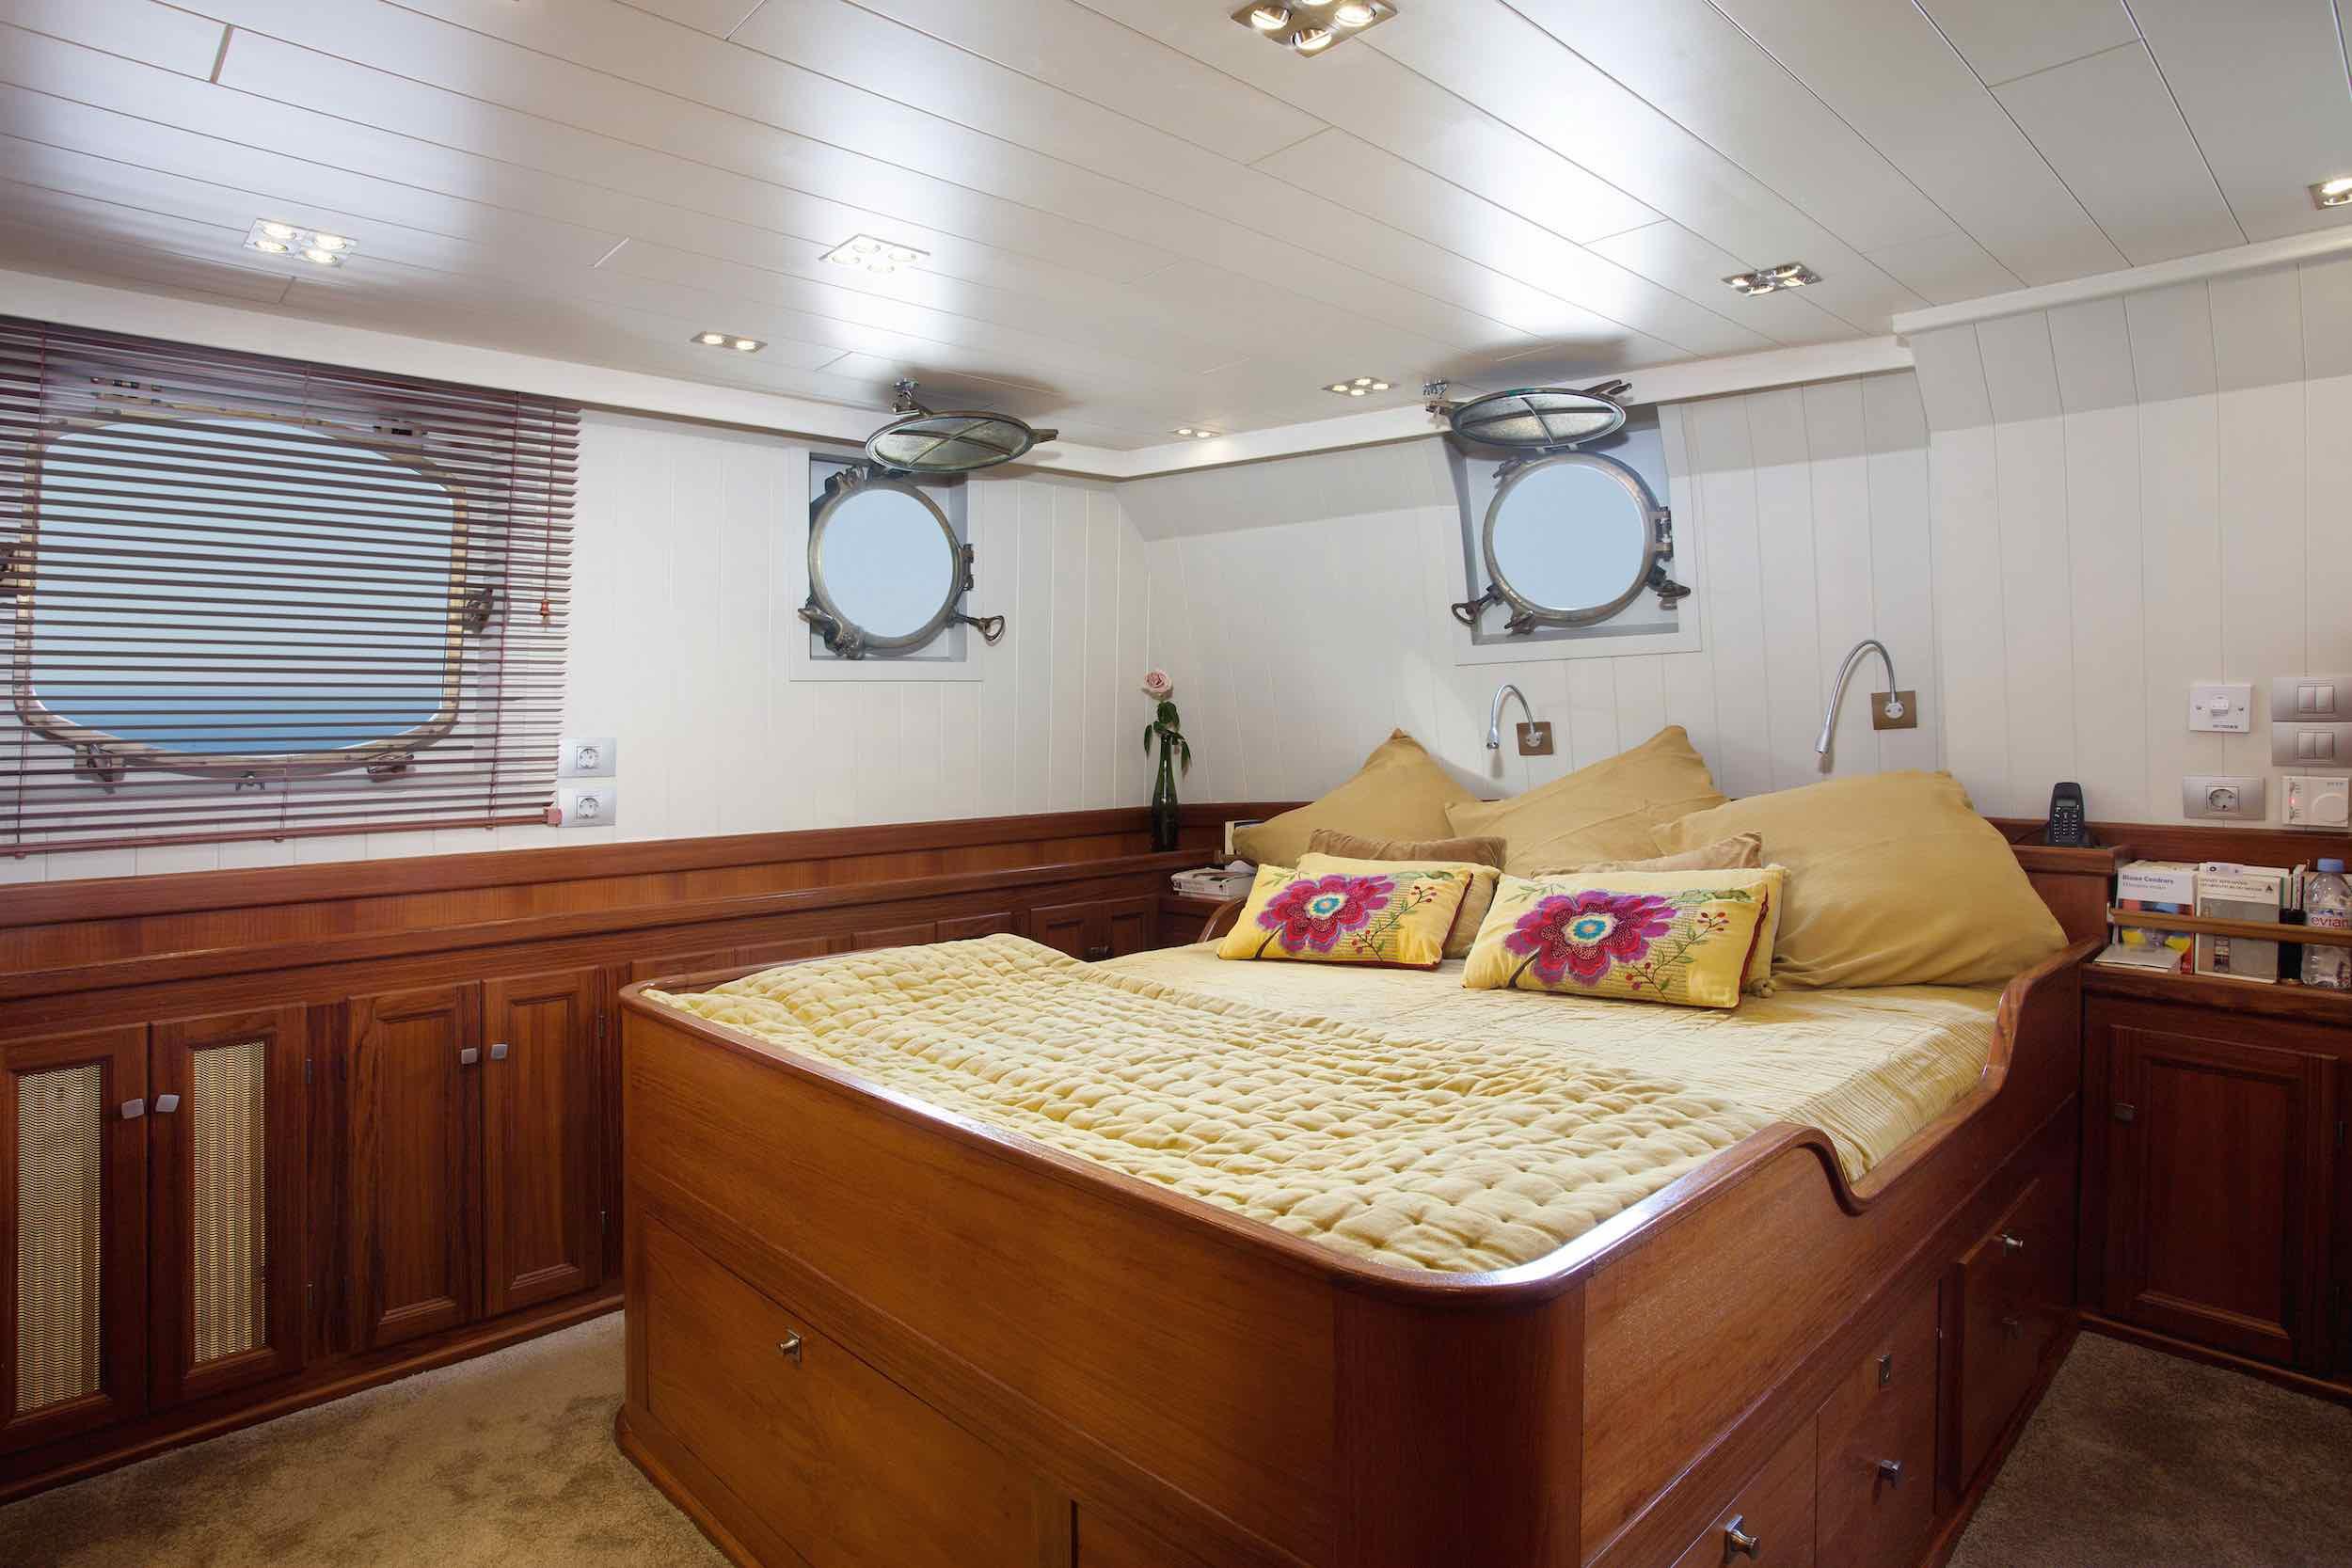 Motor yacht Drenec large cabin.jpeg